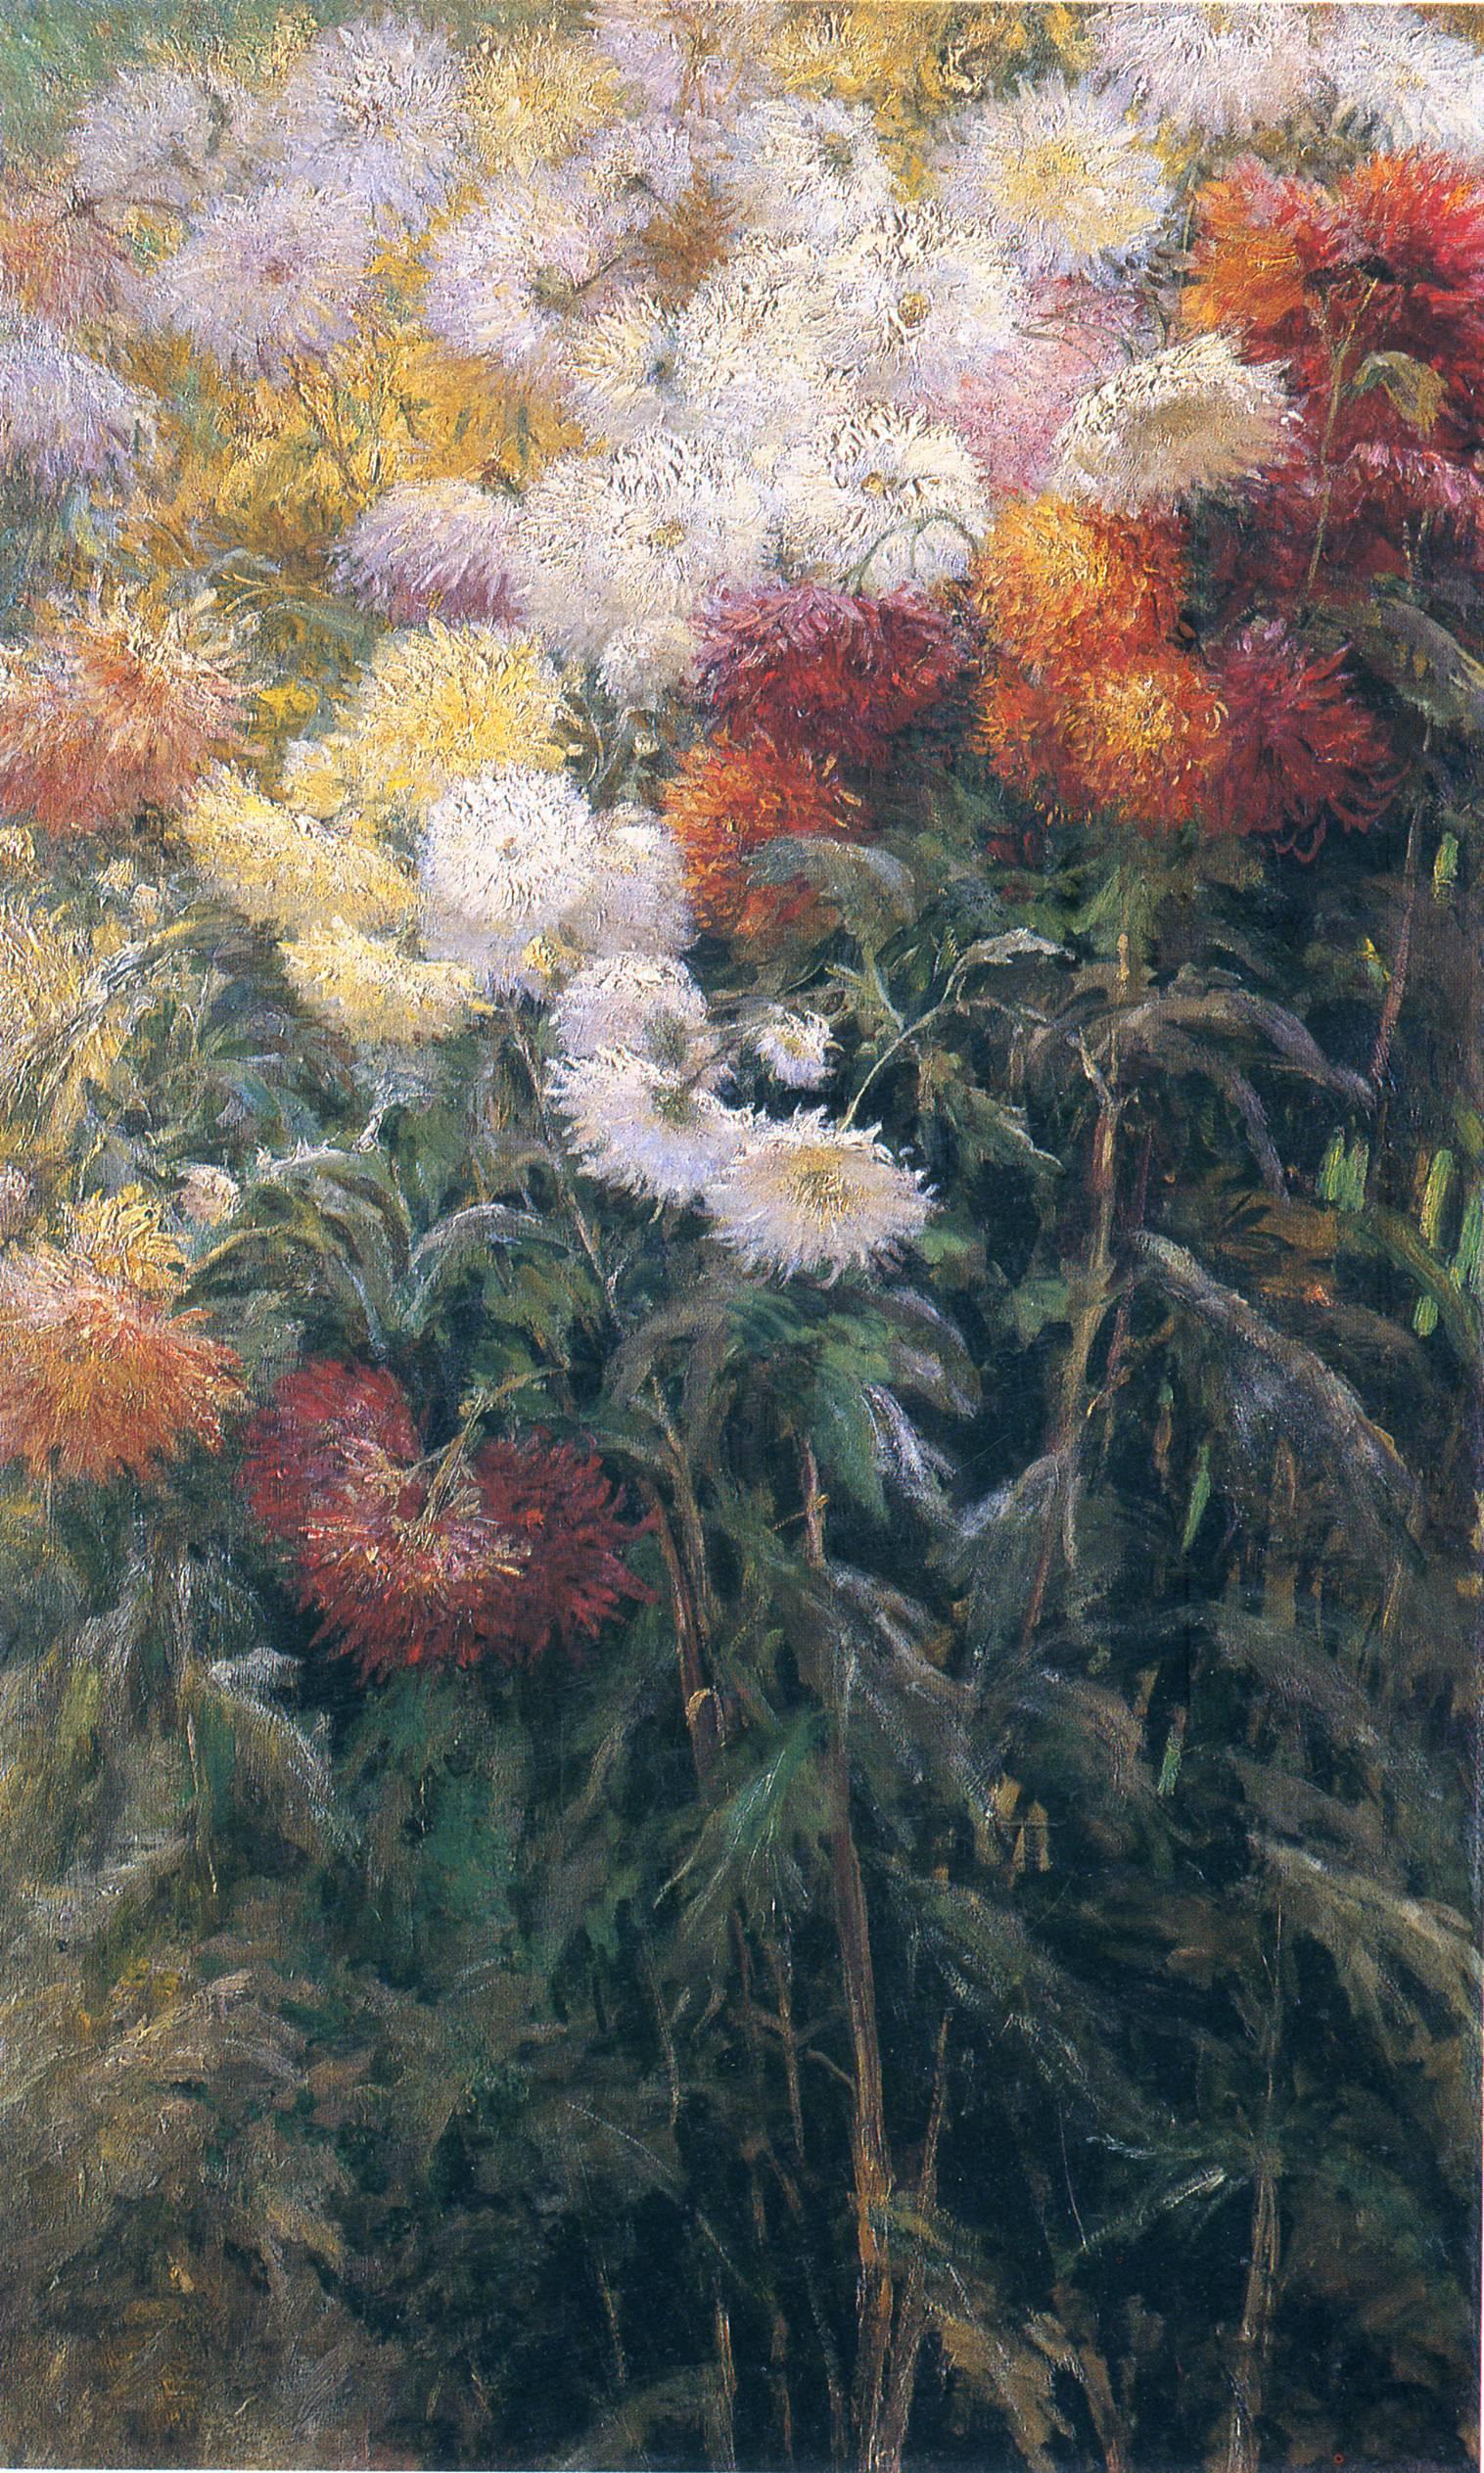 Clump of Chrysanthemums, Garden at Petit Gennevilliers, 1890